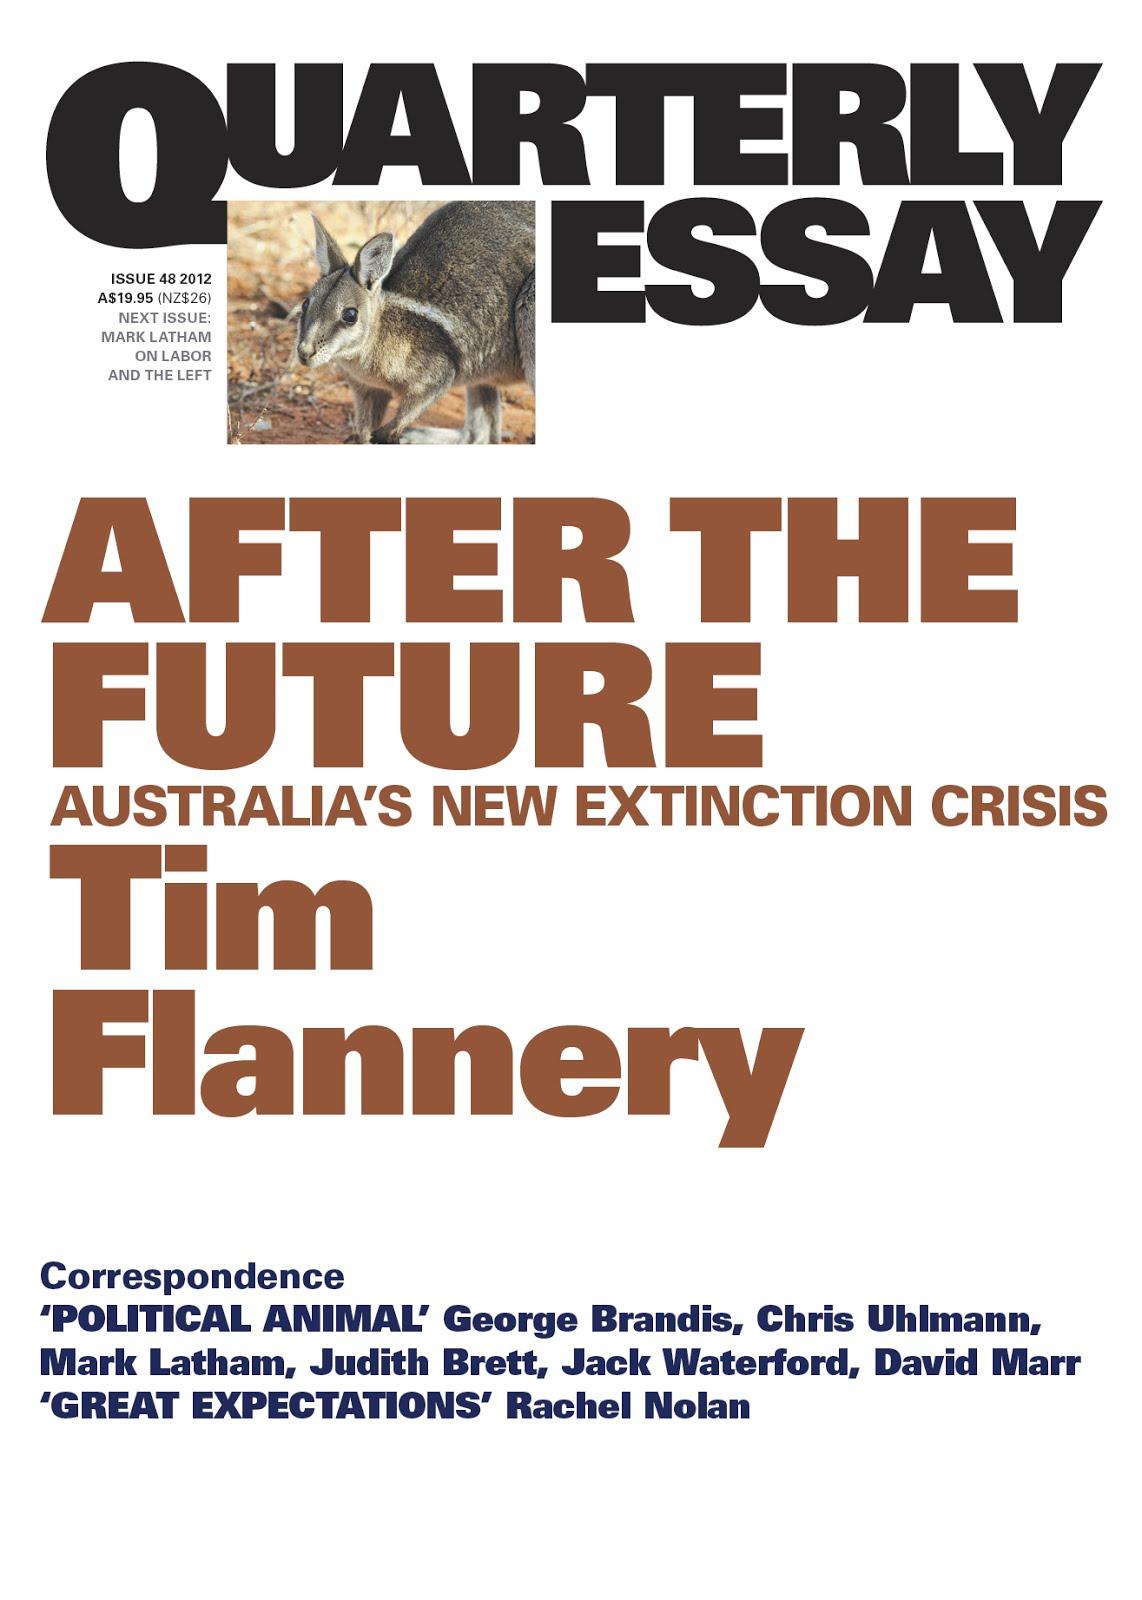 Essay Writing Service | Trusted Australian Writing Service